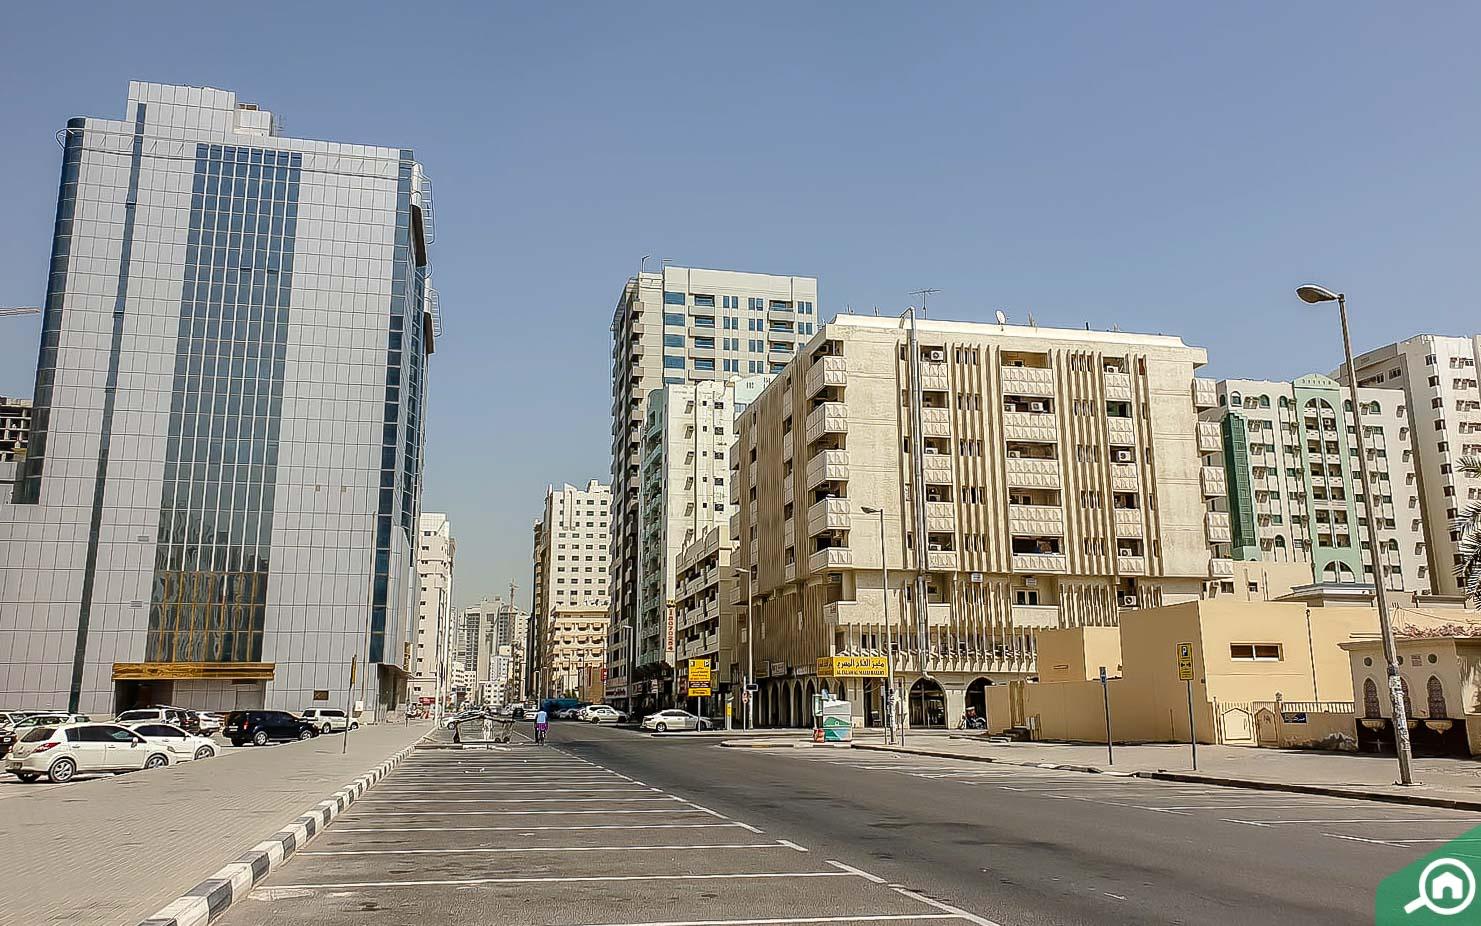 Street view in Abu Shagara